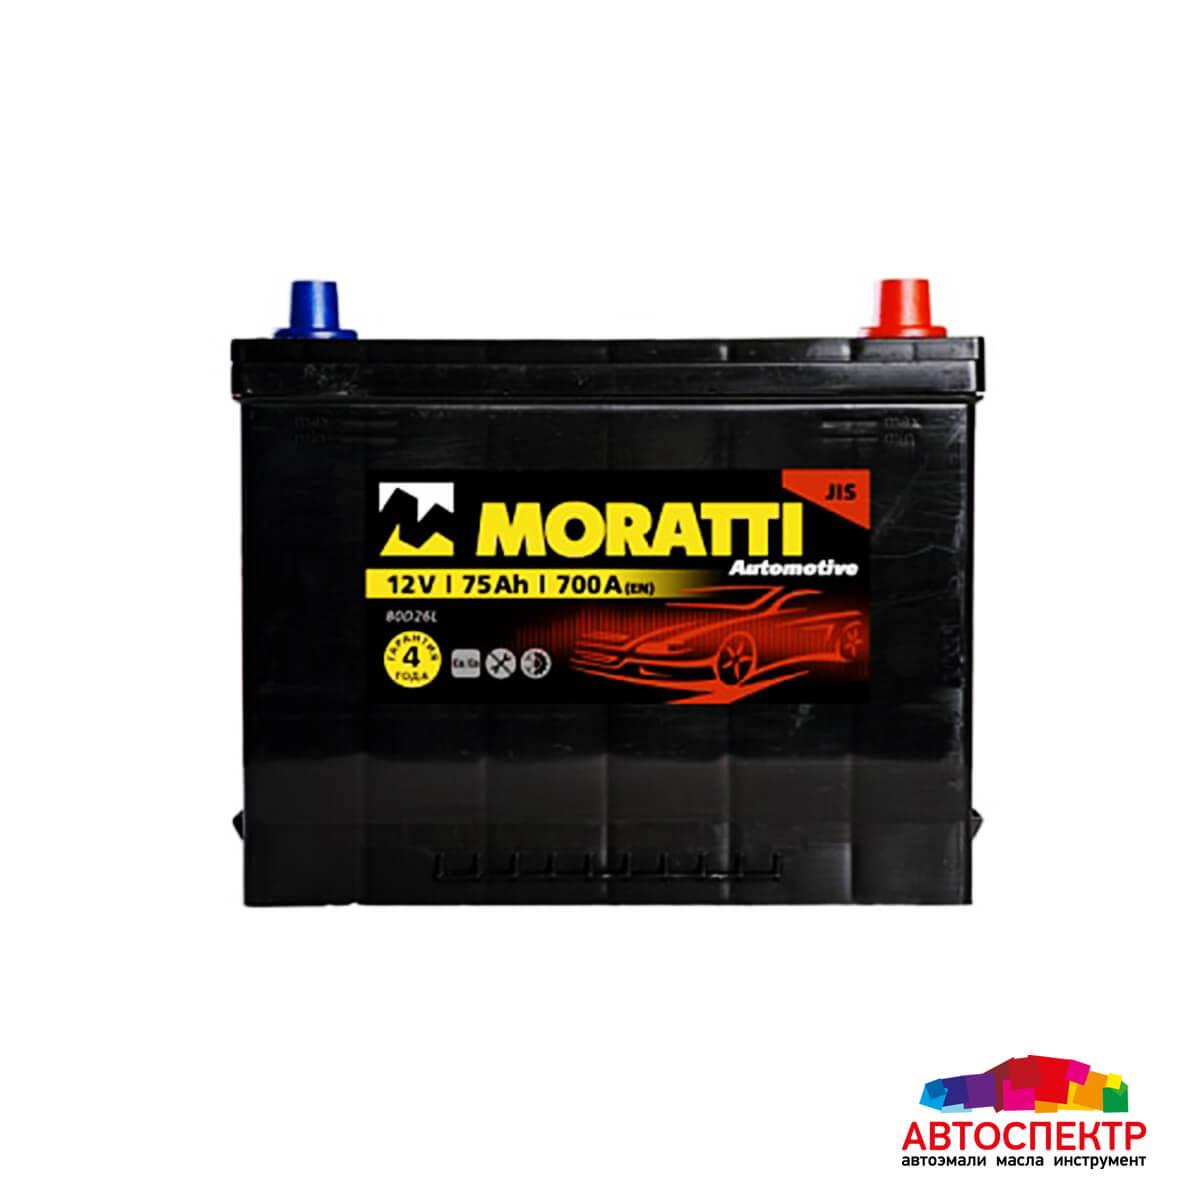 MORATTI Аккумуляторная батарея автомобильная  75 A/h прямая полярность Asia